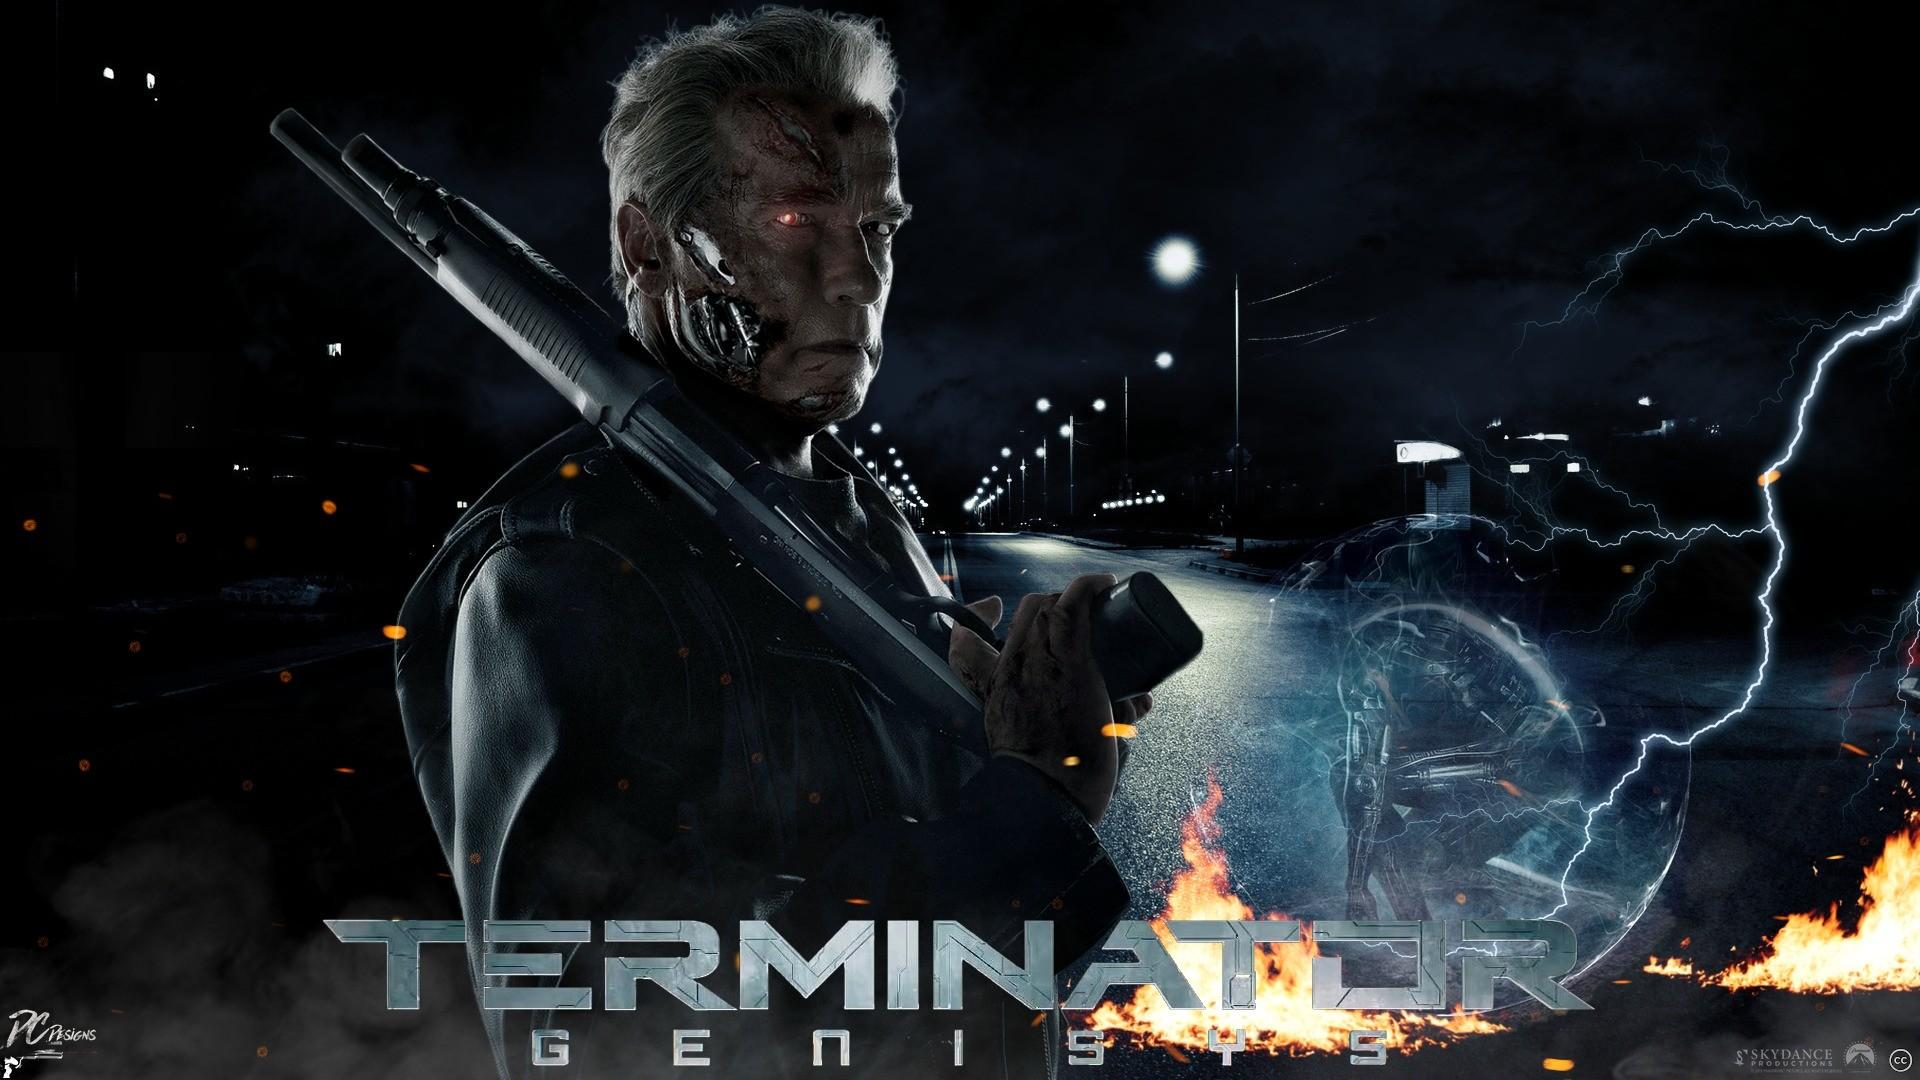 Res: 1920x1080, Terminator 2: Judgment Day Wallpaper 21 - 1920 X 1080